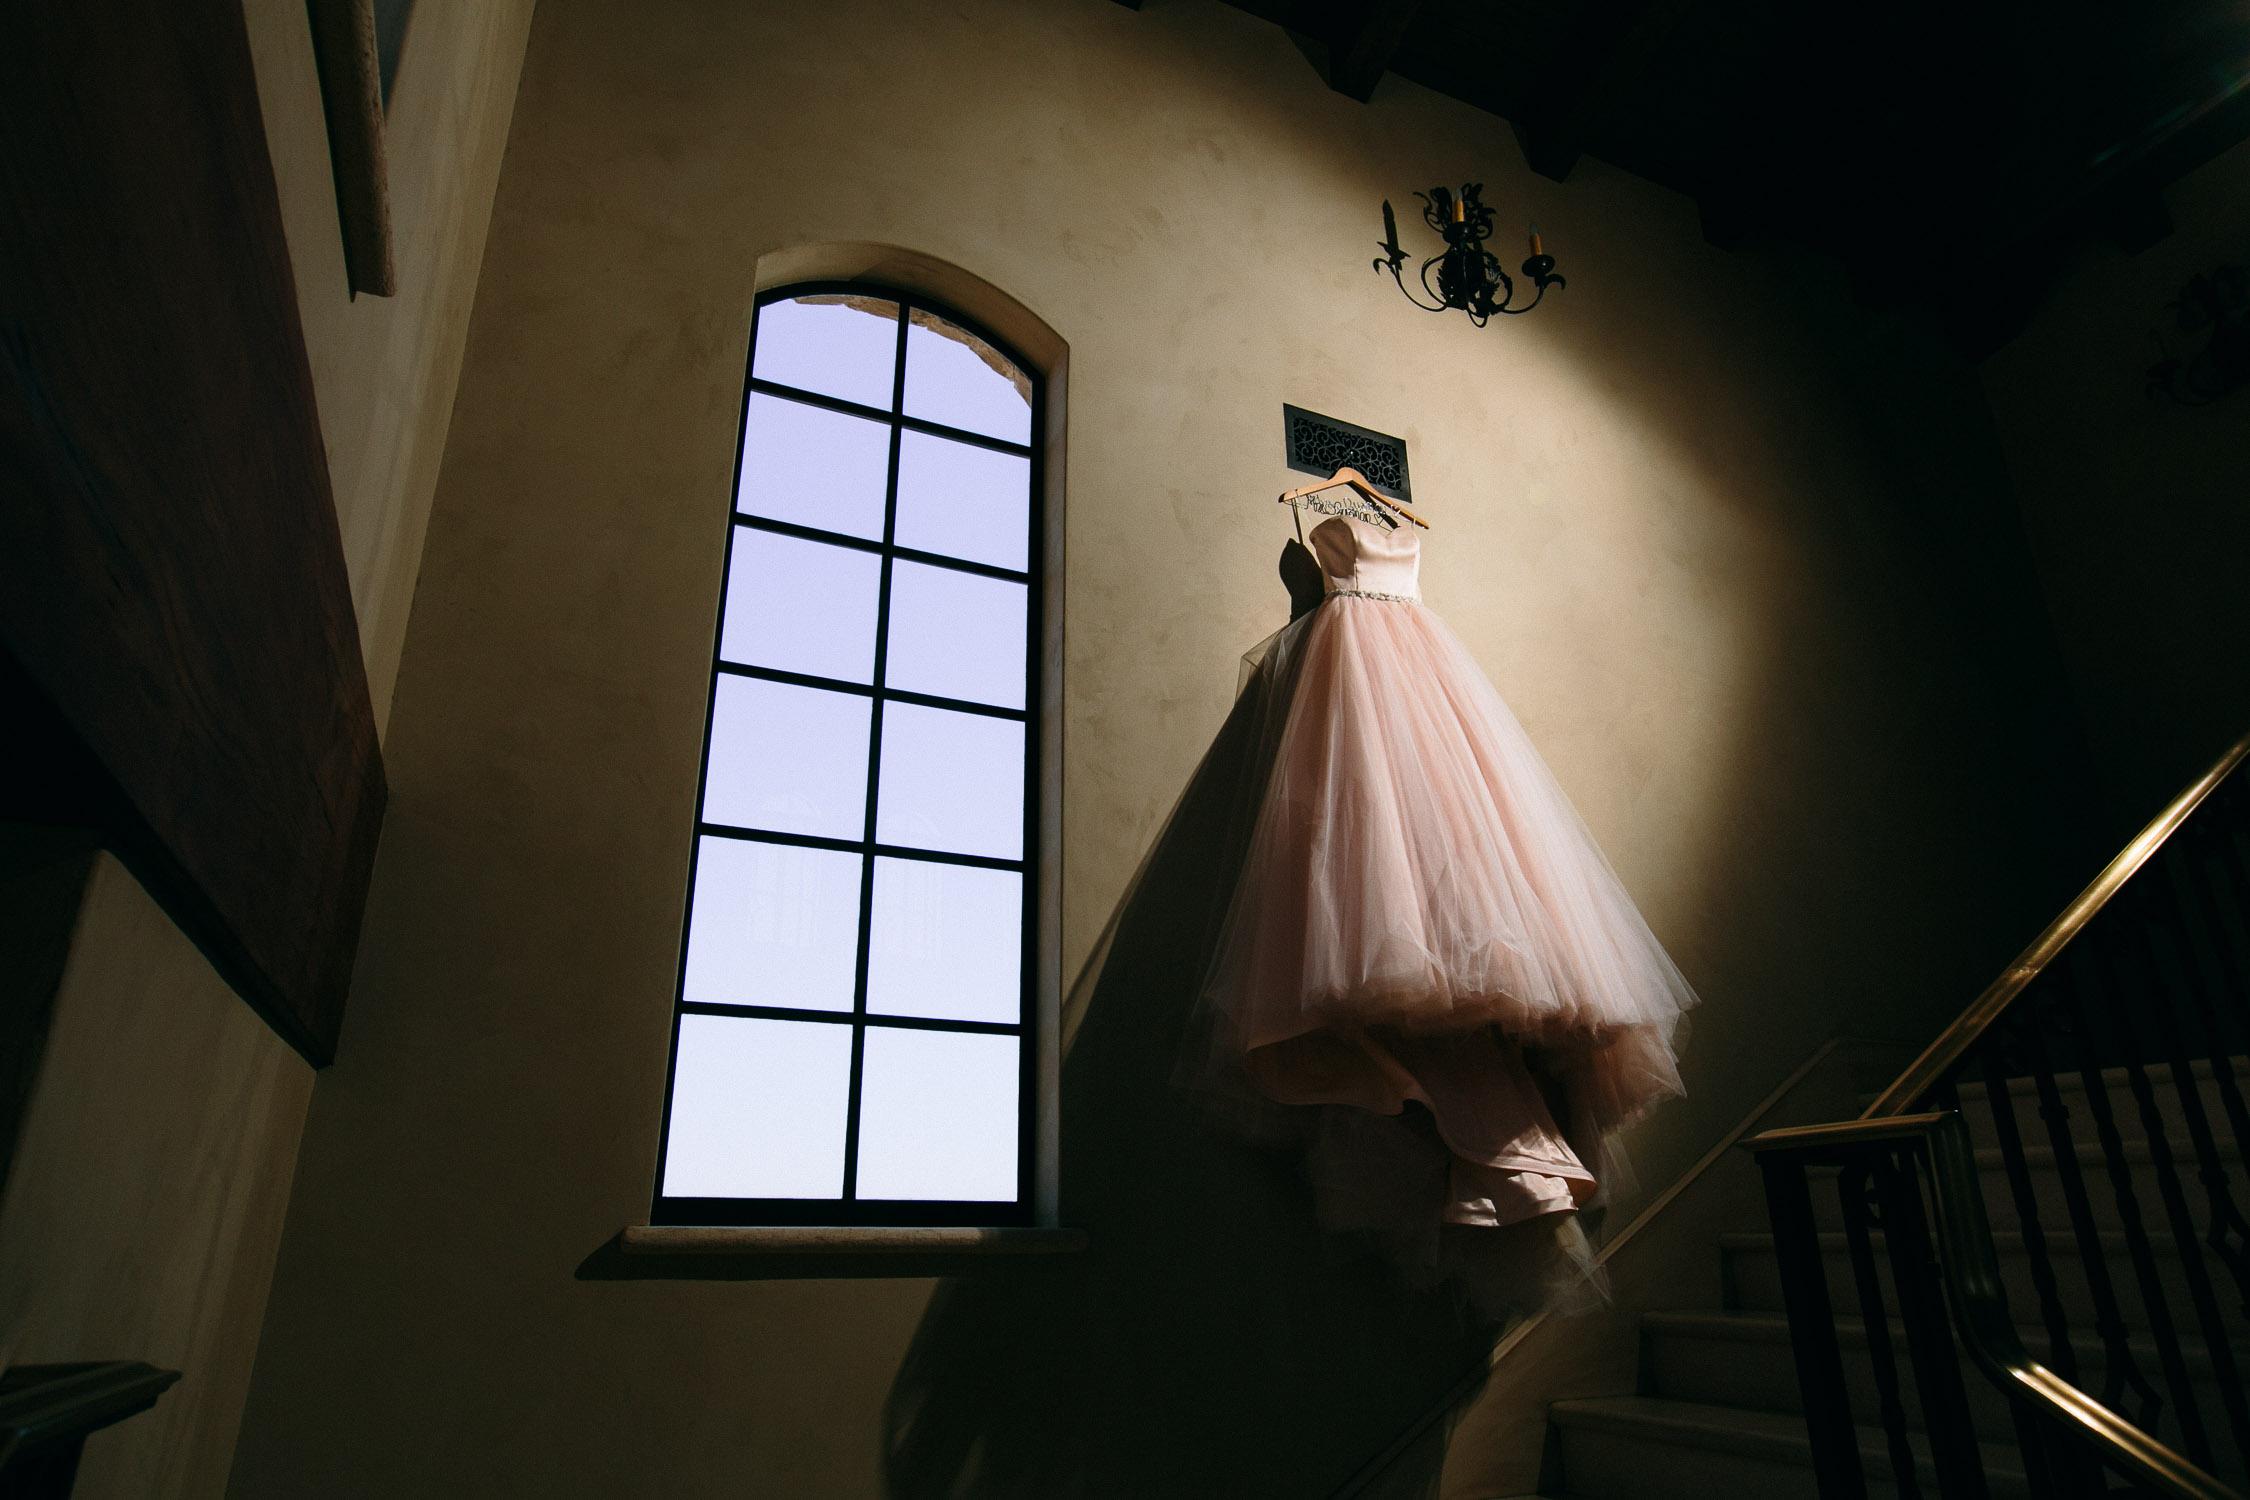 Malibu Rocky Oaks JLK Couture Wedding dress hanging in hallway